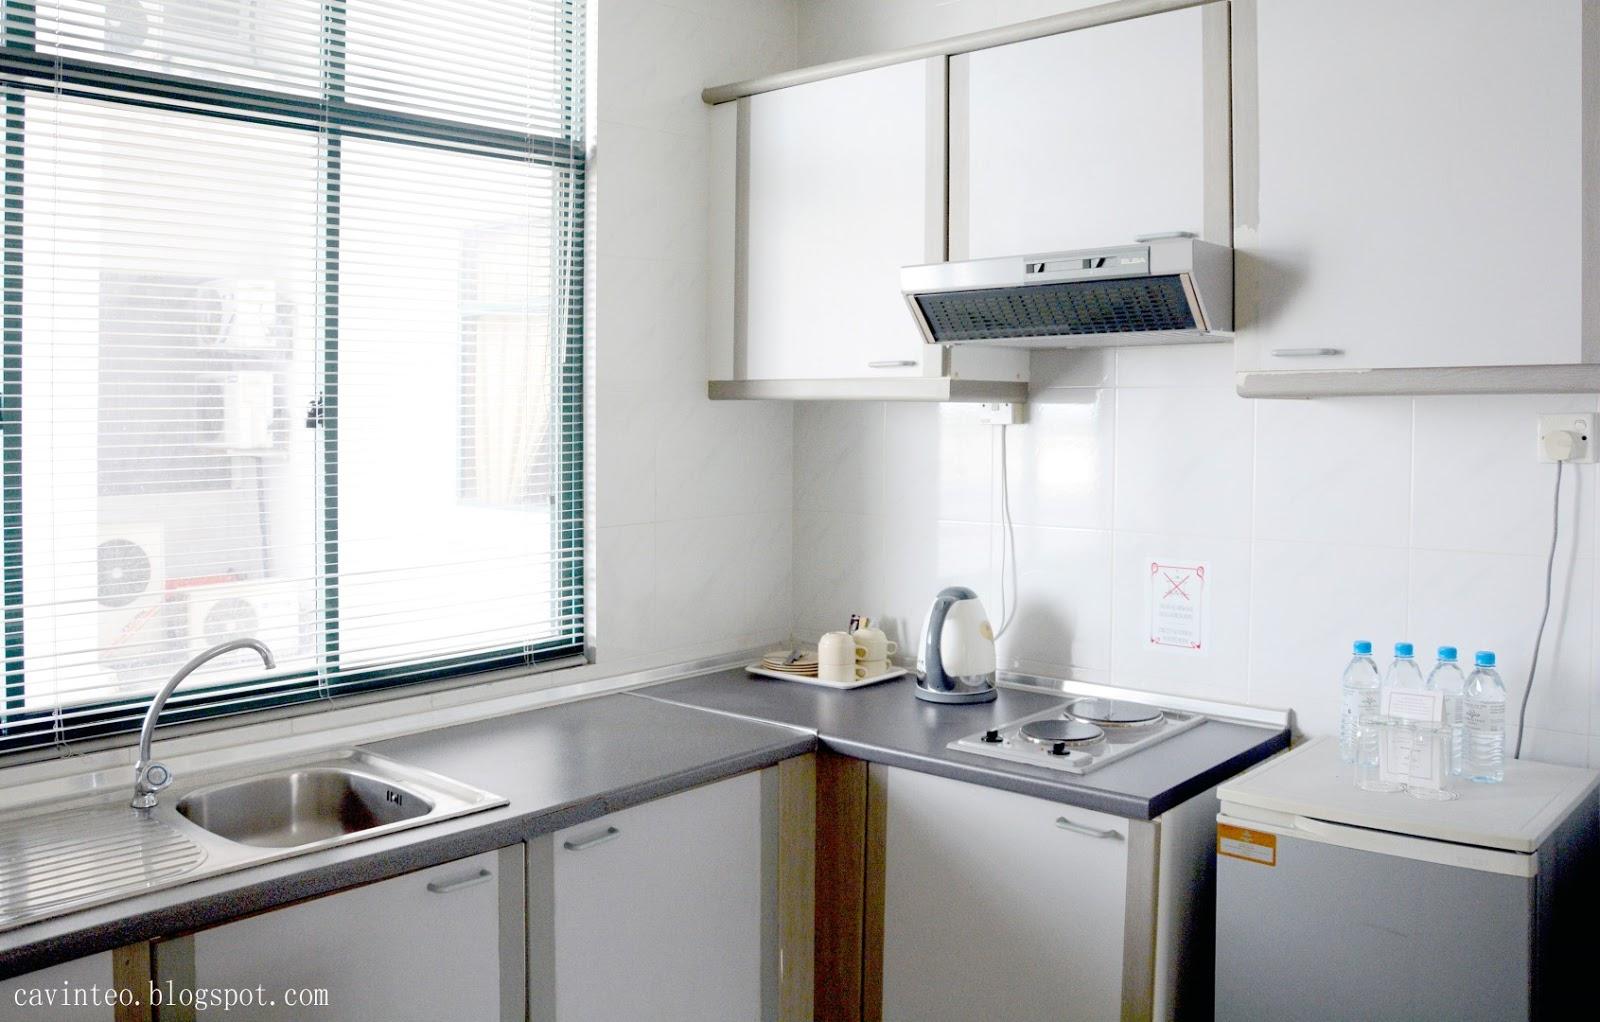 Entree Kibbles Mahkota Hotel 2 Bedroom Deluxe Apartment